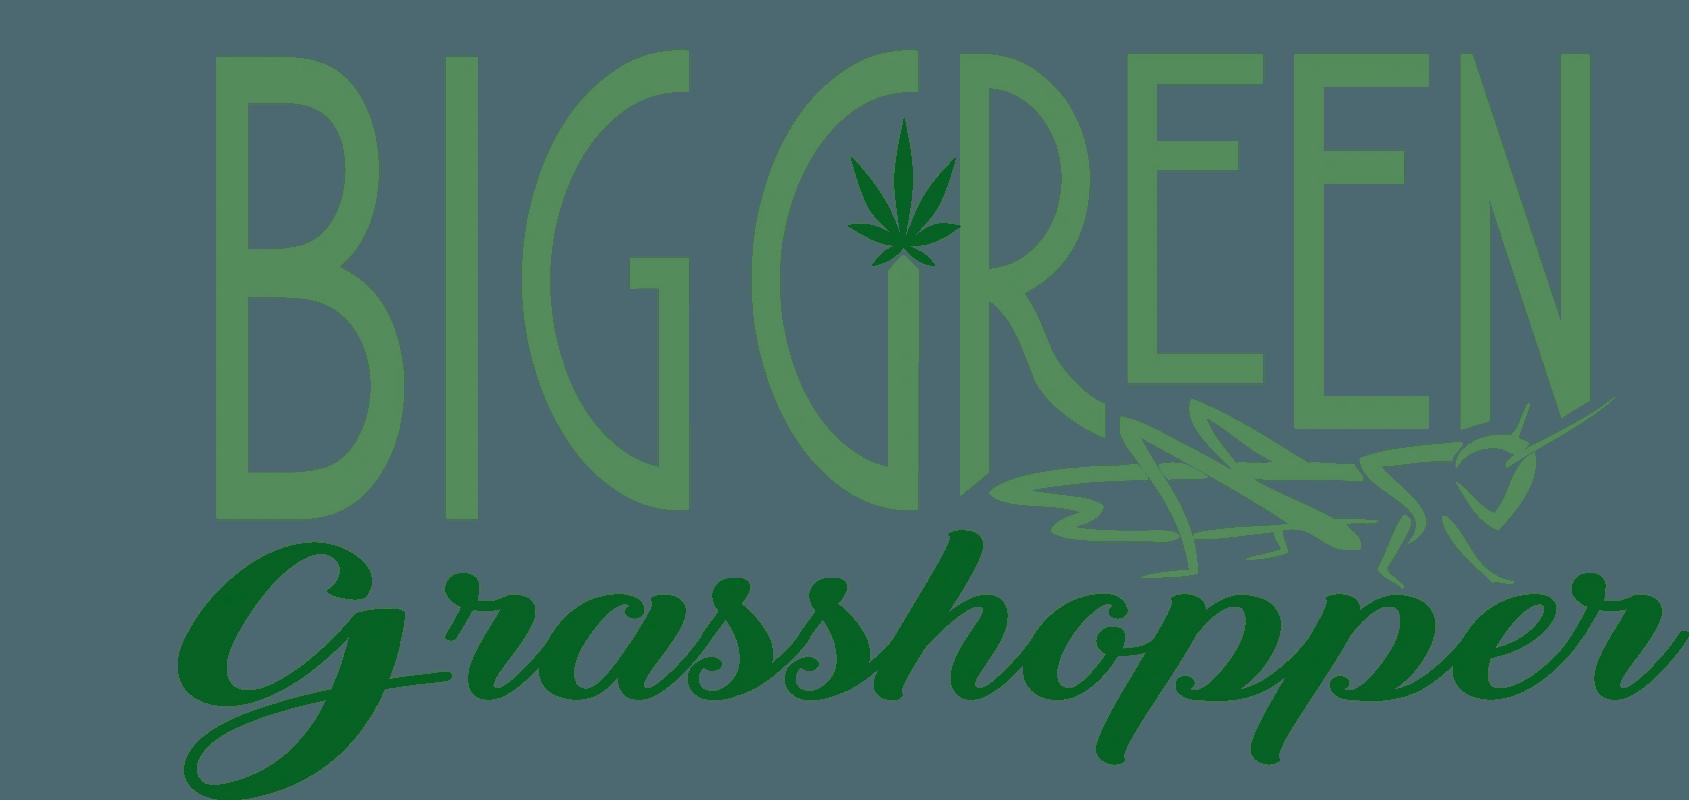 green-grasshopper